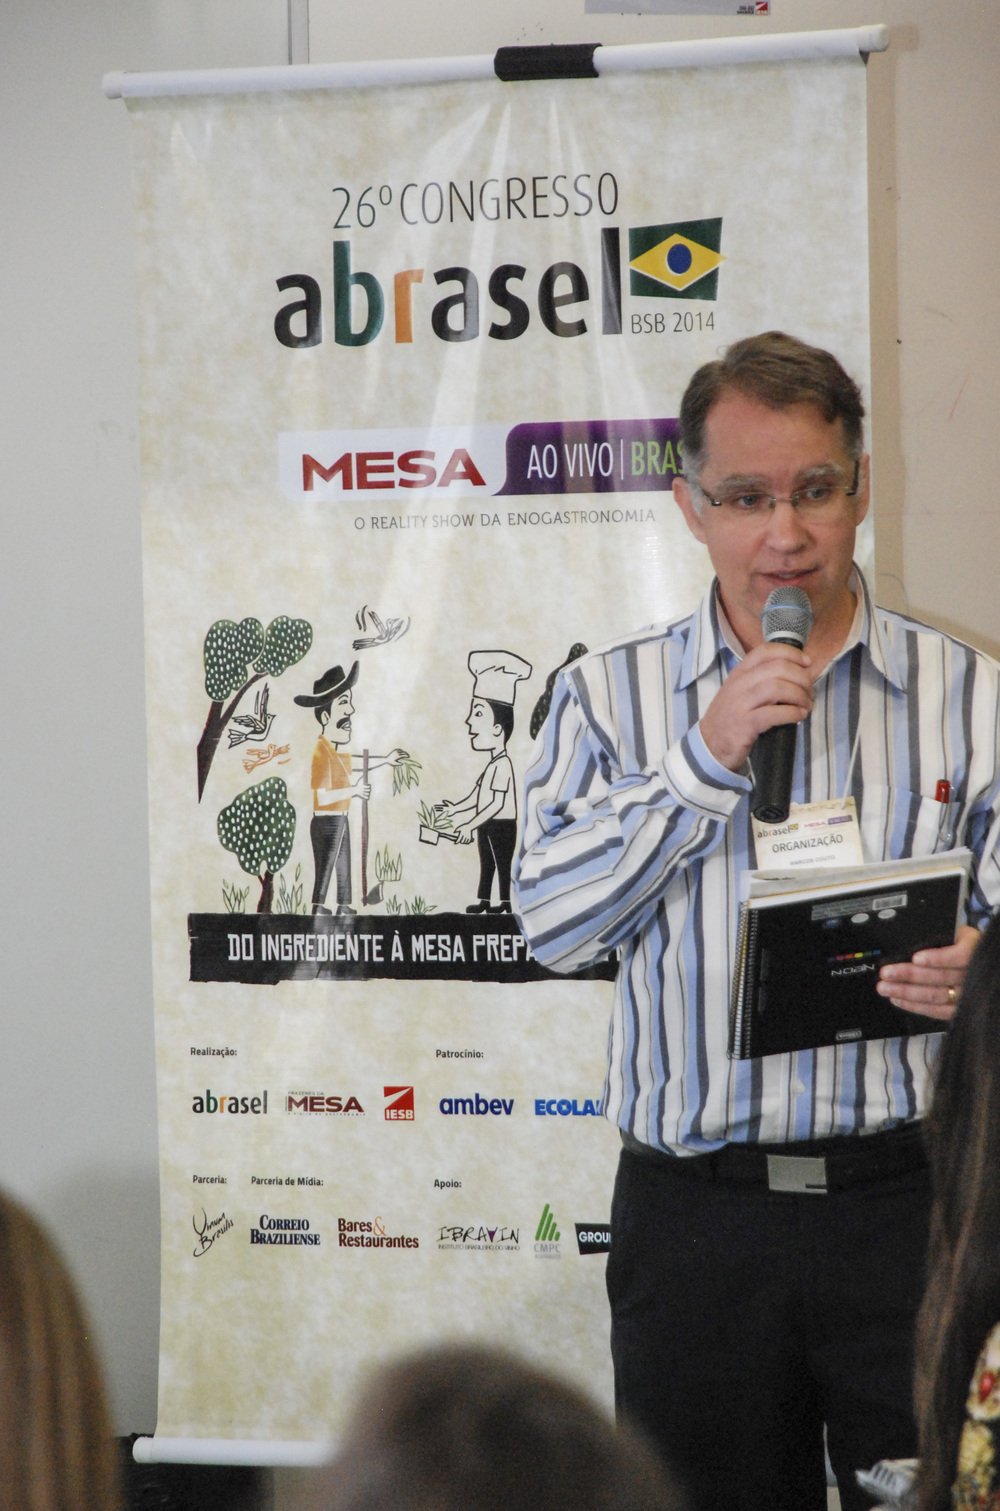 workshop_Fotografa_Marcela Marinho_1.jpg